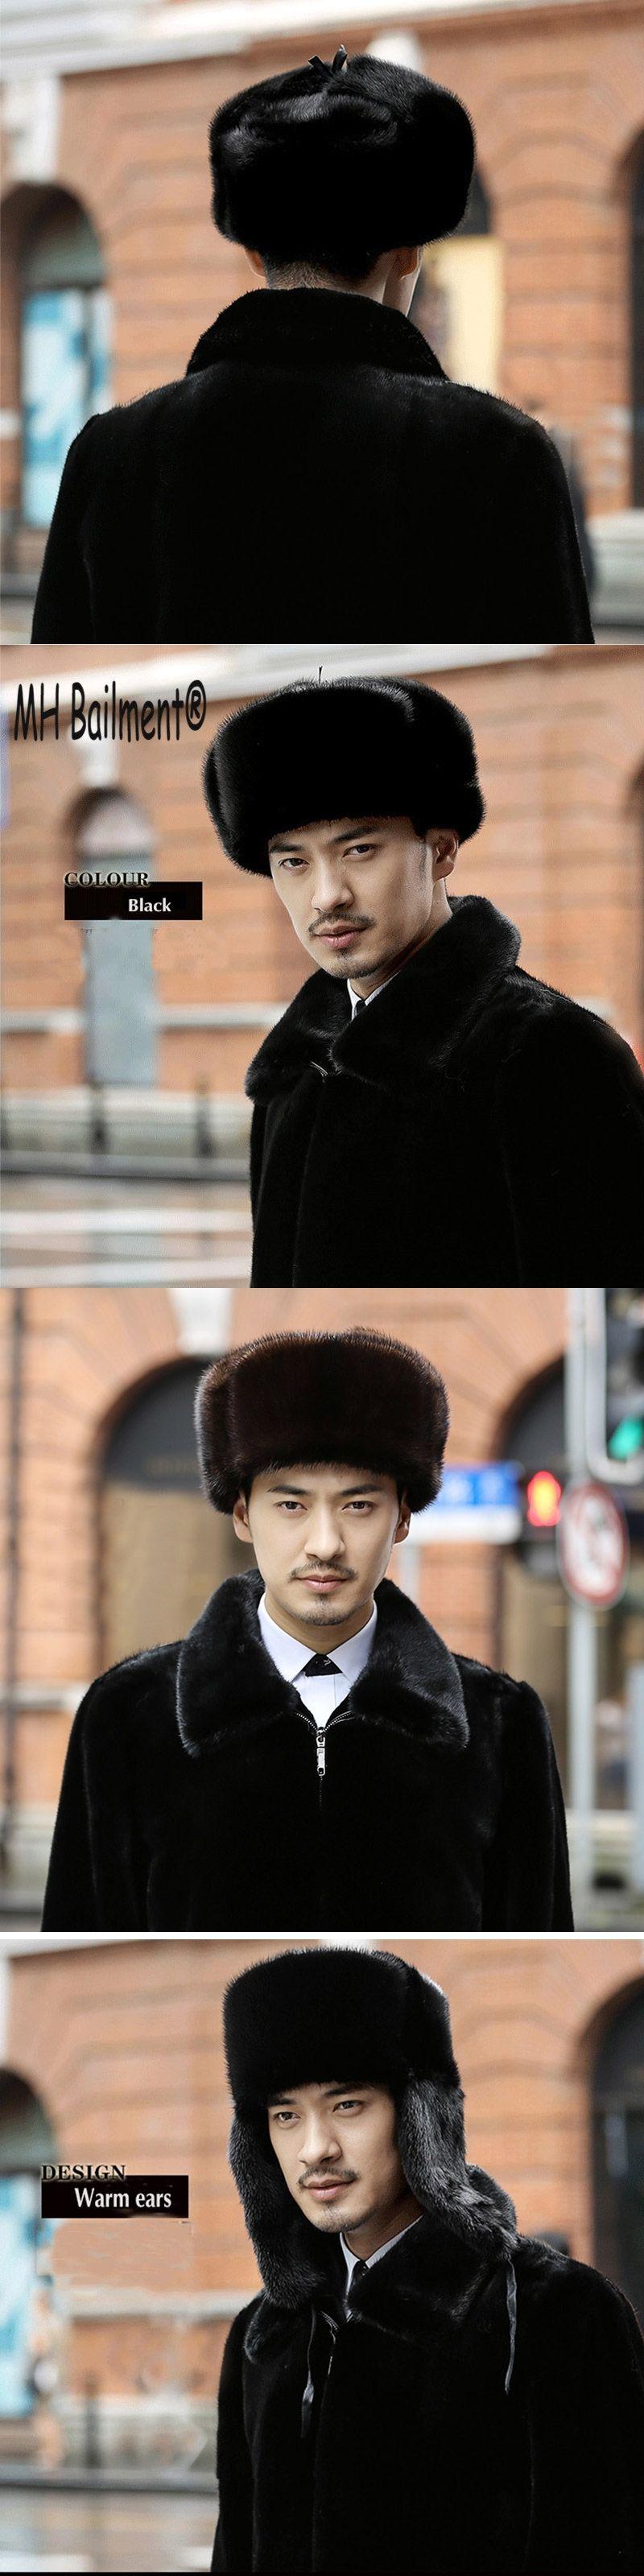 4aa902d1b8c 2017 Russian Men Real Mink Fur Hats Winter Warm Ear Outdoor luxury Caps  Casual Fur Bomber